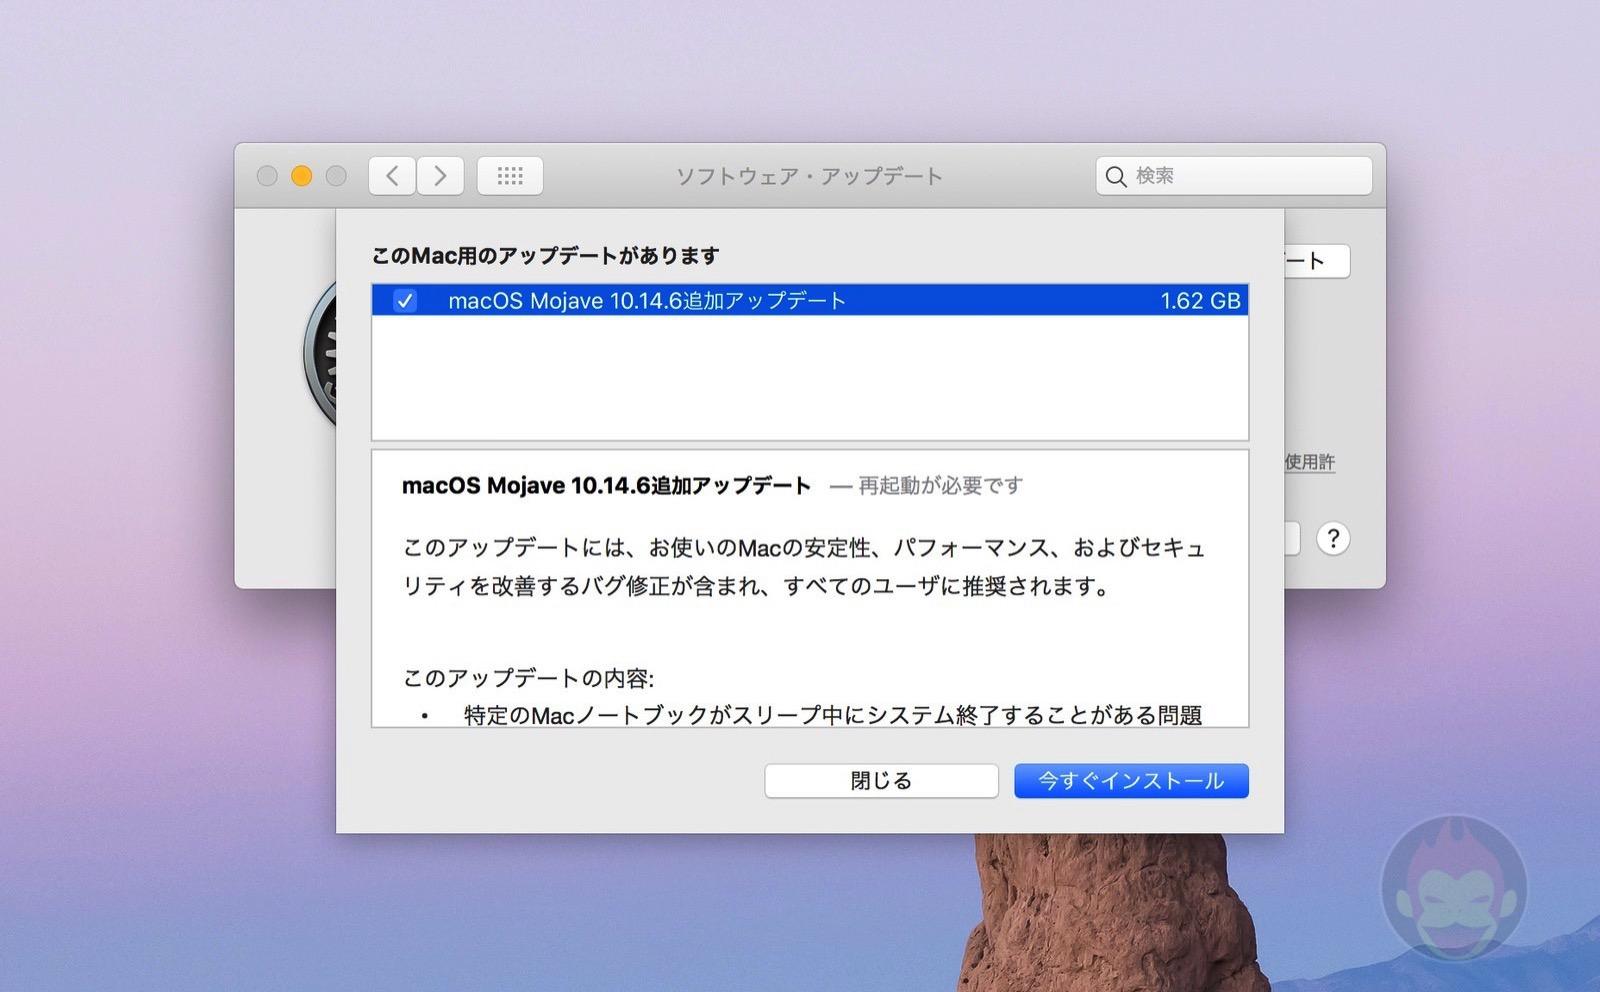 MacOS Mojave Update Aud27 01